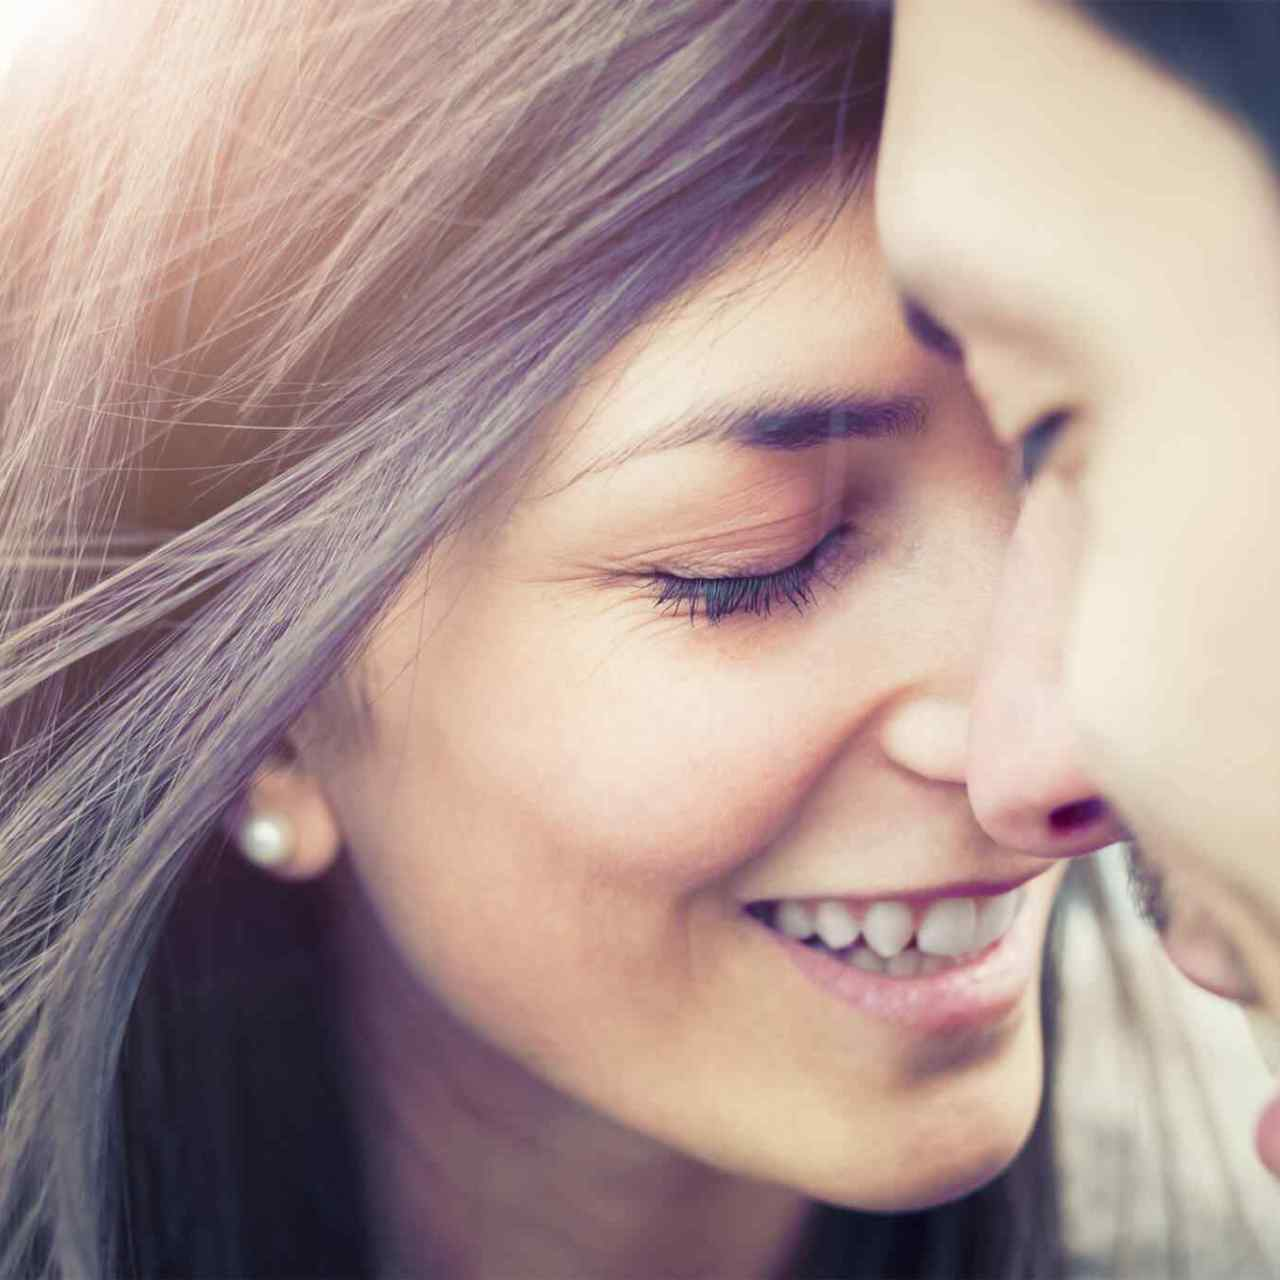 https://i0.wp.com/truhap.com/wp-content/uploads/2018/01/img-class-marriage-01.jpg?resize=1280%2C1280&ssl=1